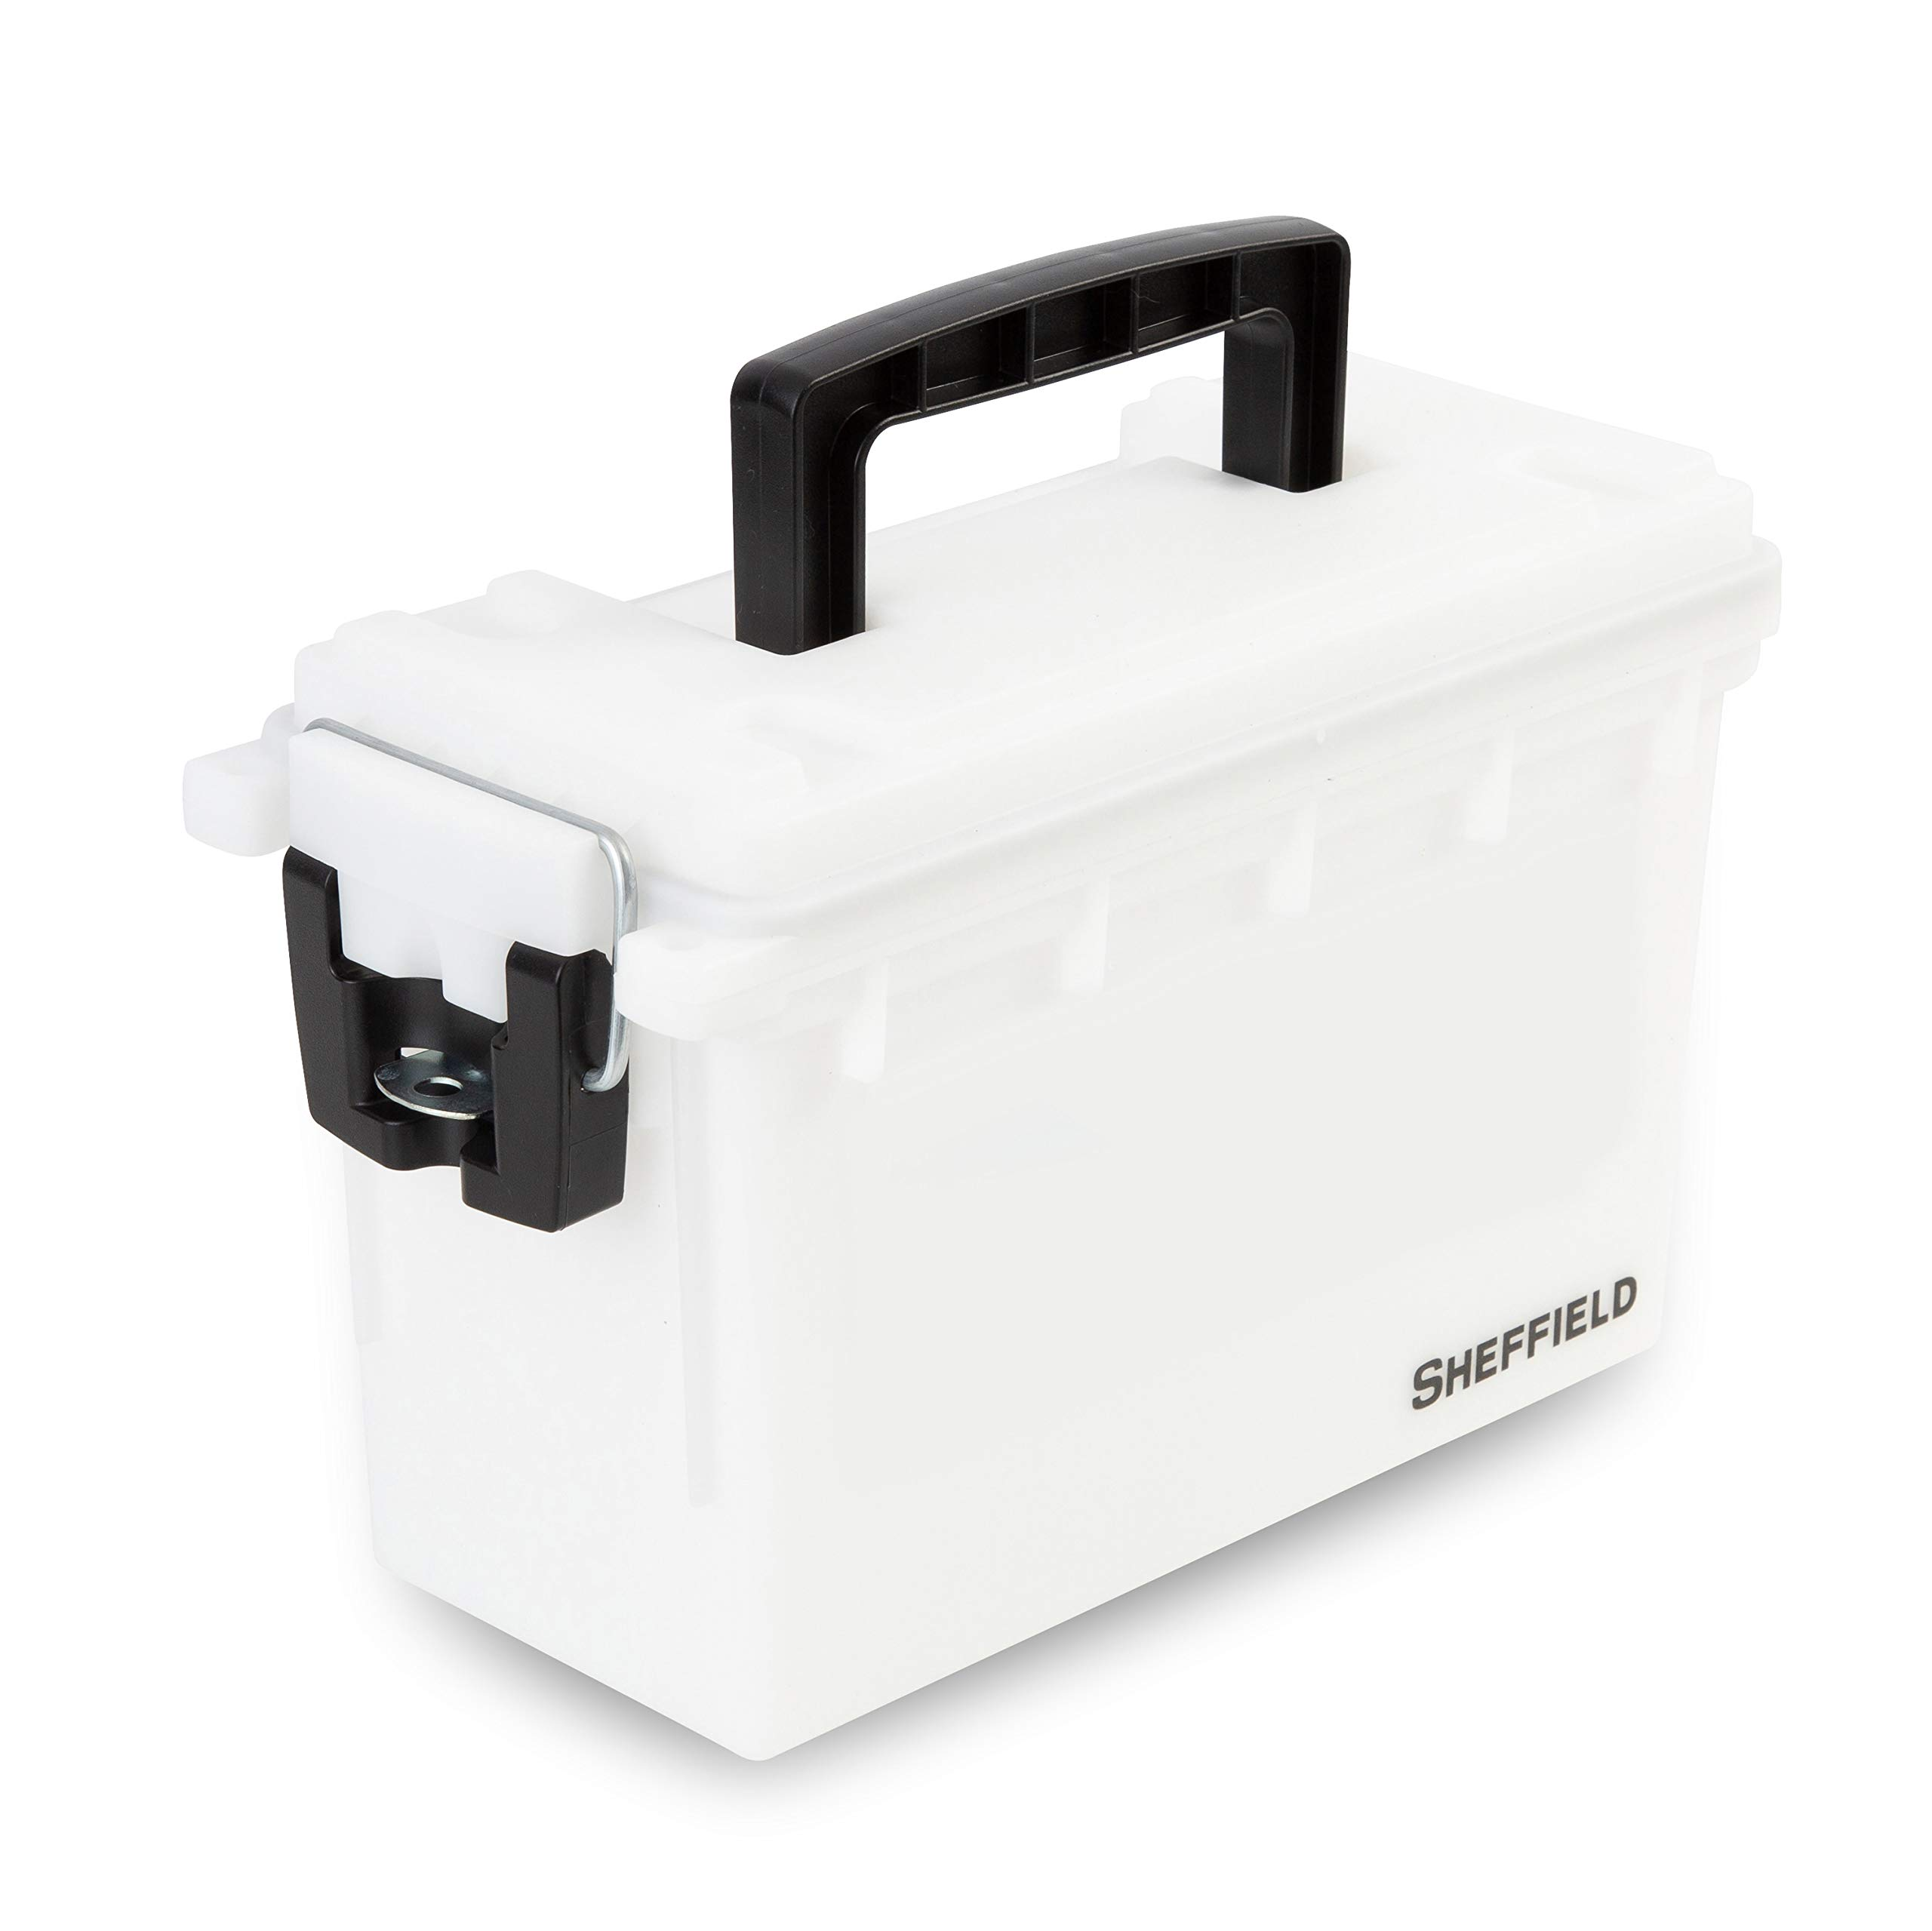 Sheffield 12634 Field Box- Artic White